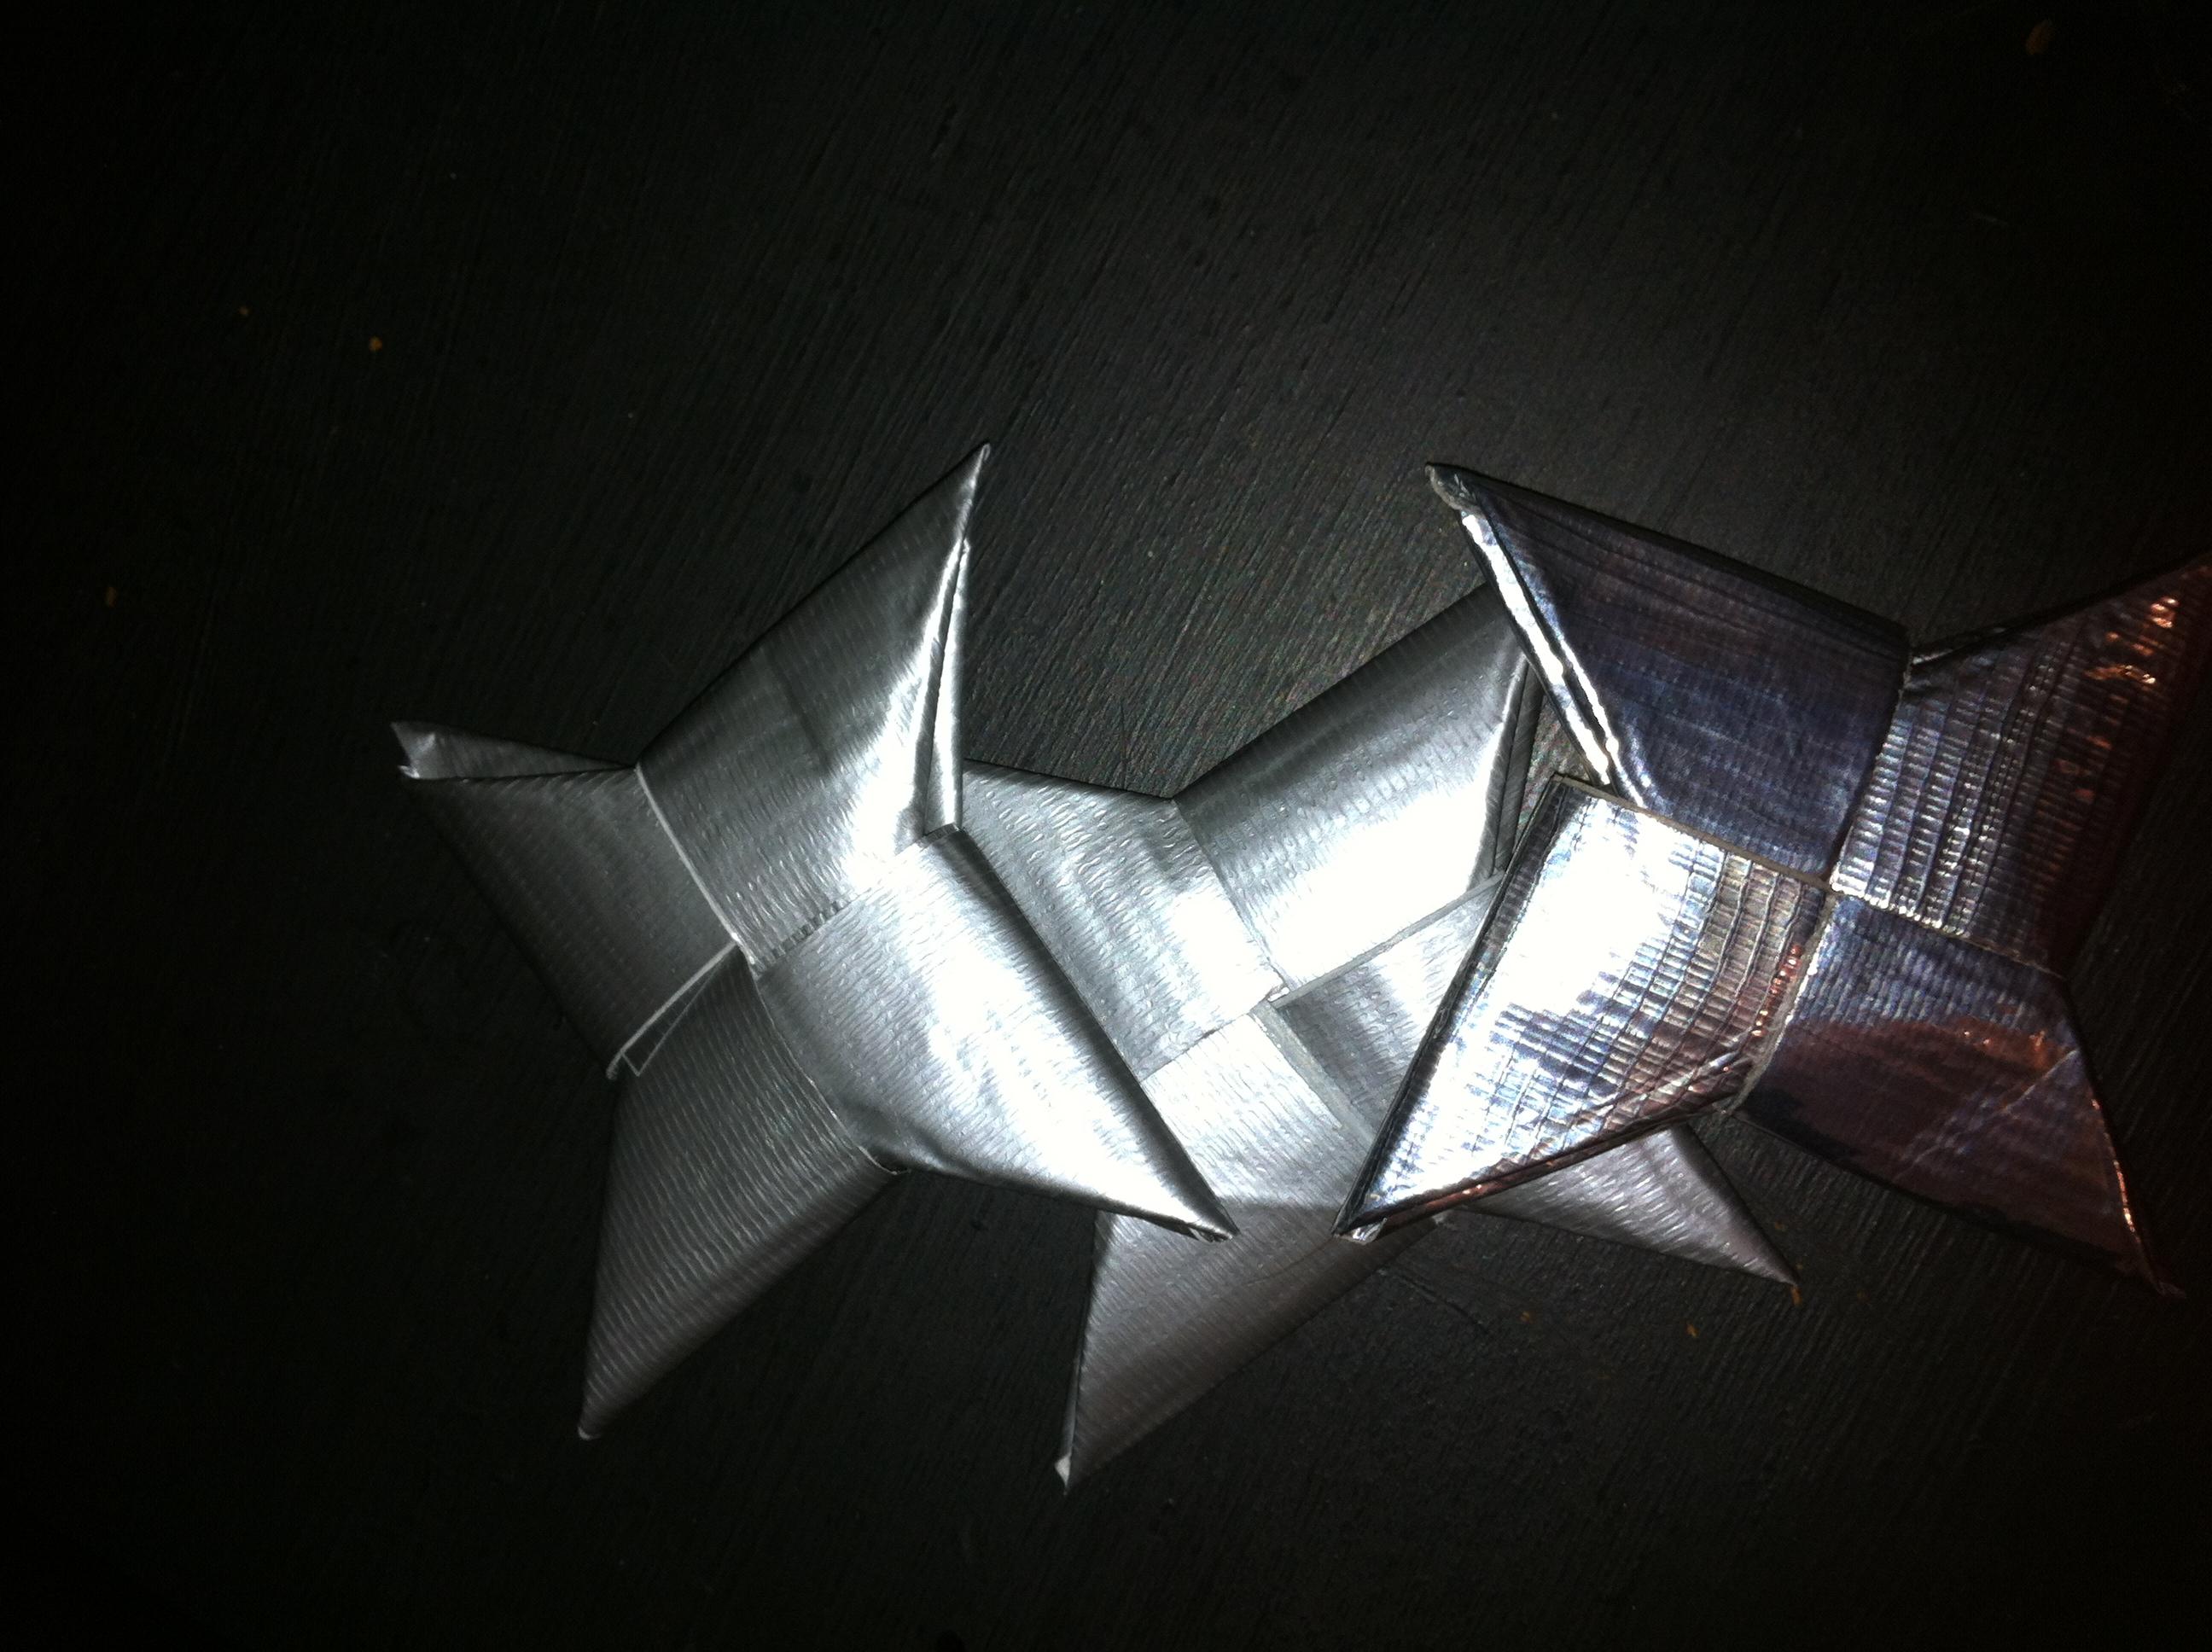 Duct Tape Ninja Star t - photo#26